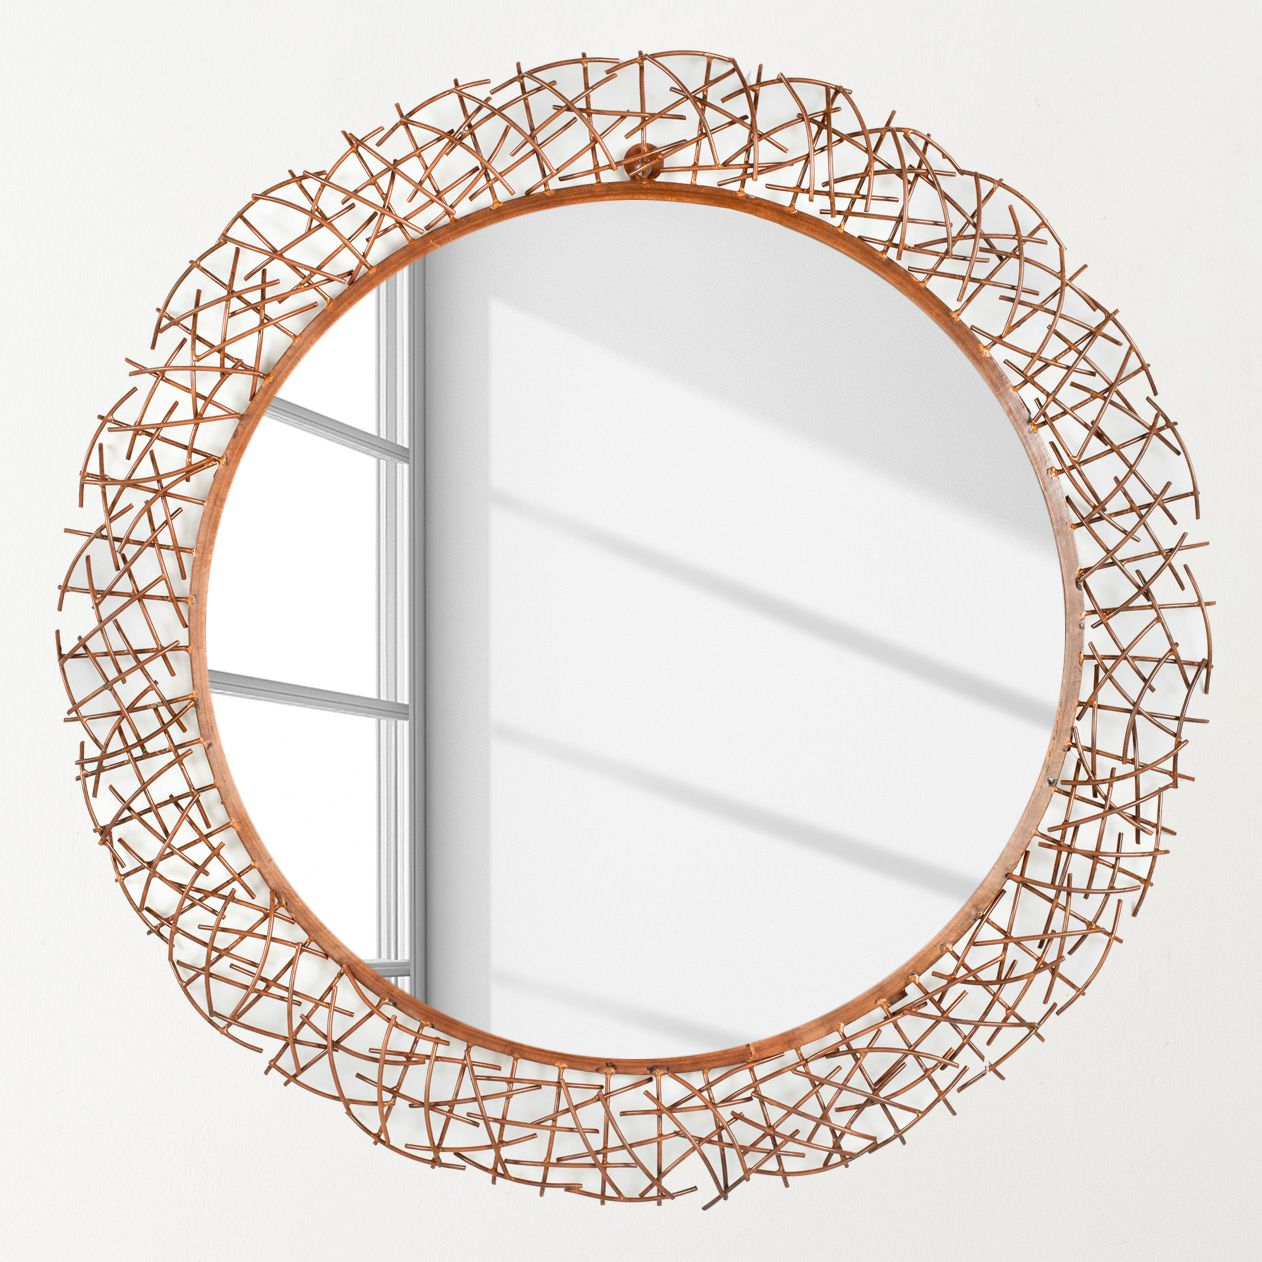 spiegel twig kupfer safavieh m saf 0714 0183 kauf dir. Black Bedroom Furniture Sets. Home Design Ideas